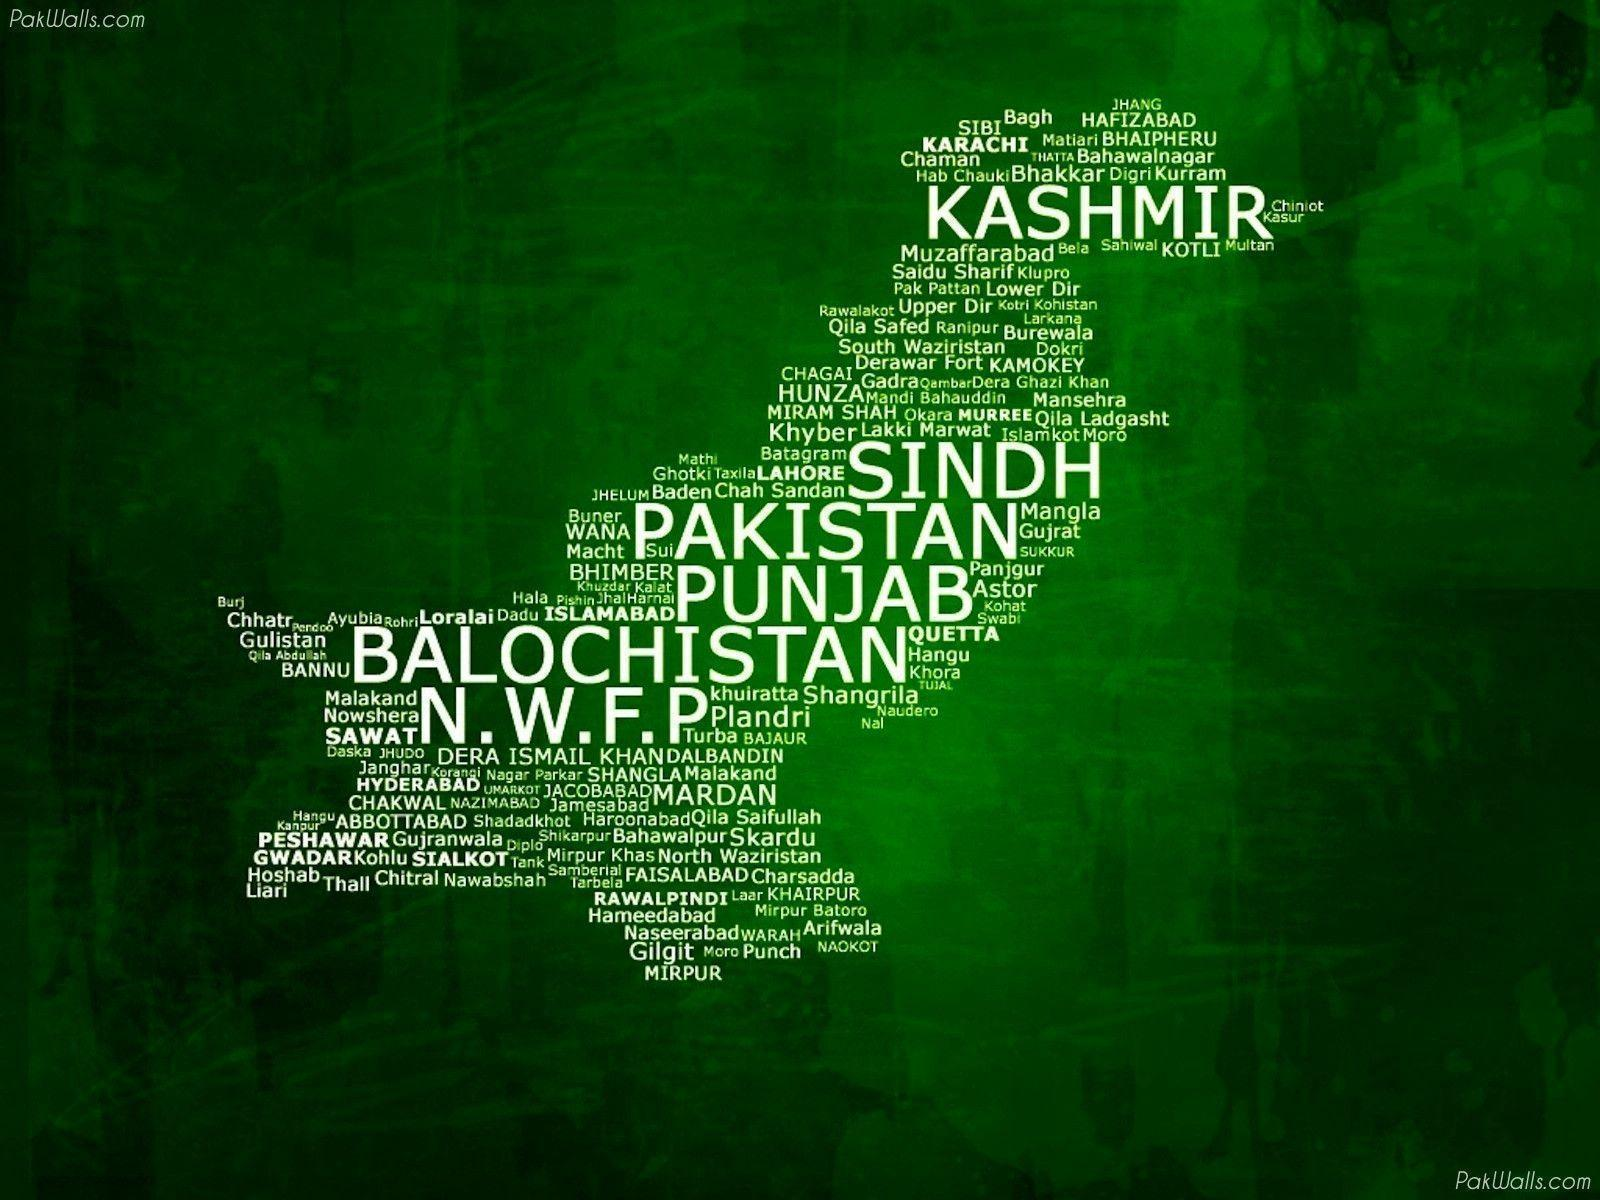 Pakistan Flag Wallpapers Hd 2014 Pakistan Wallpapers Wallpaper Cave